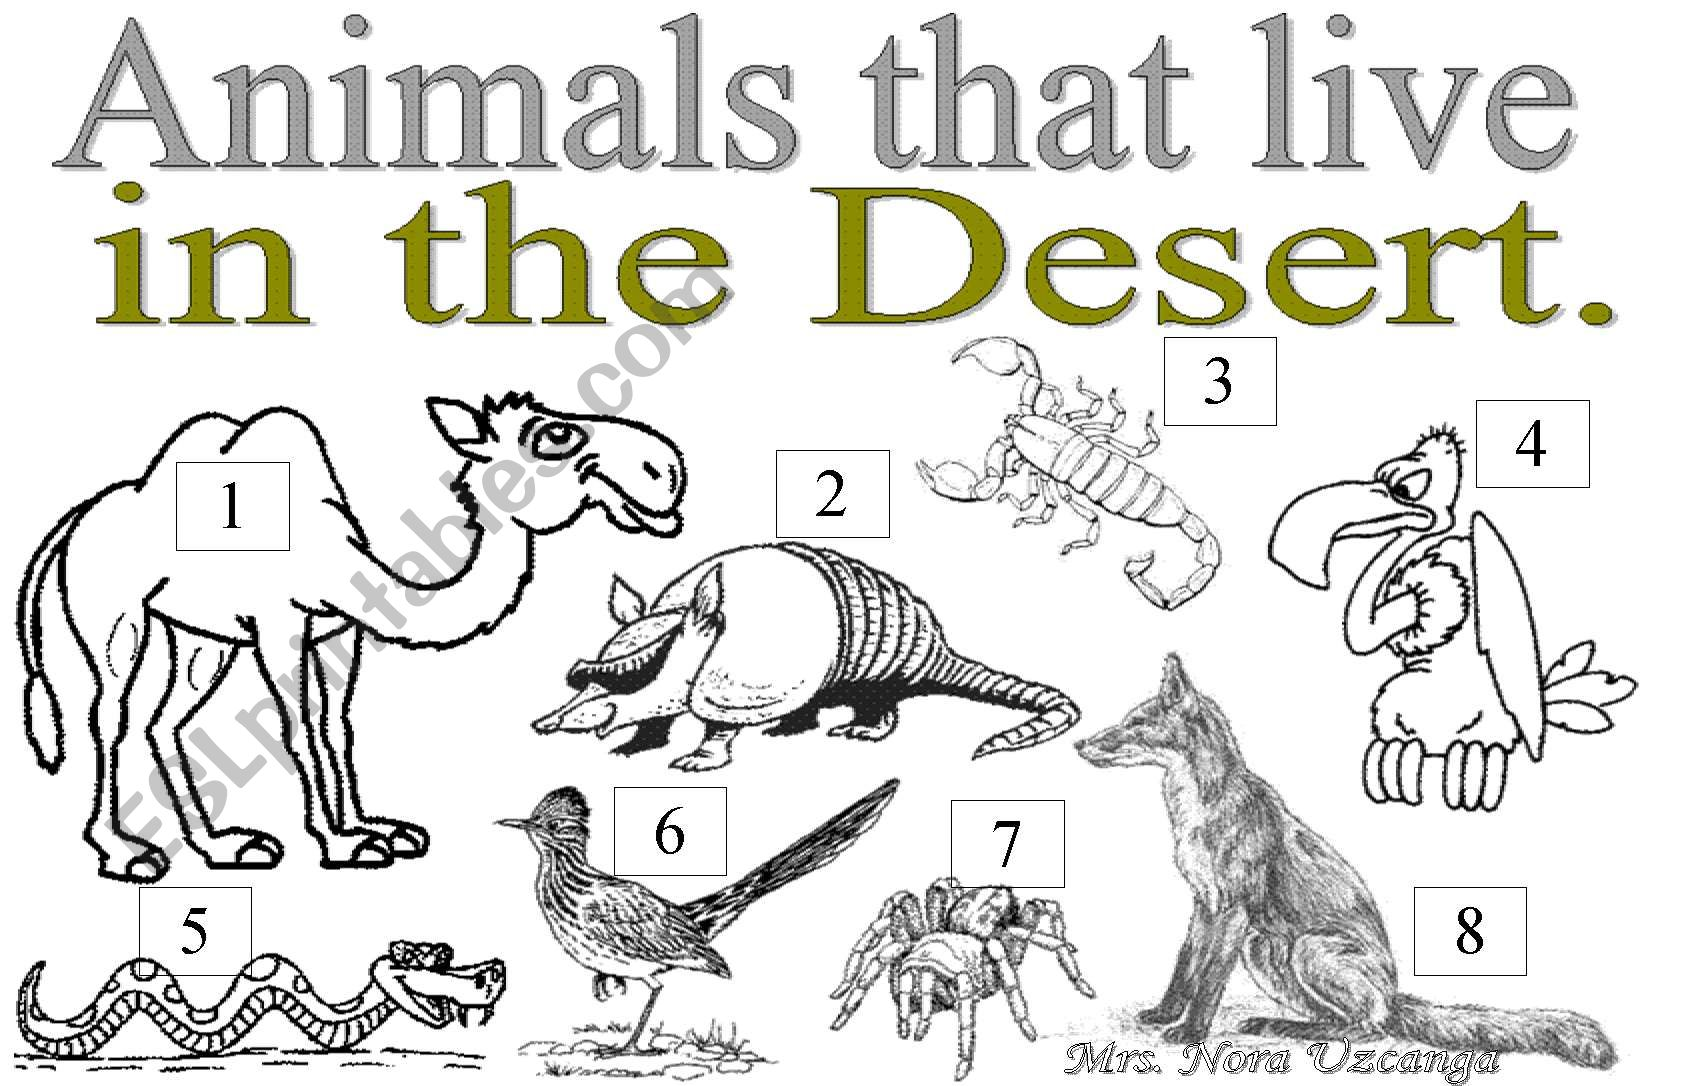 Animals Yhat Live In The Desert